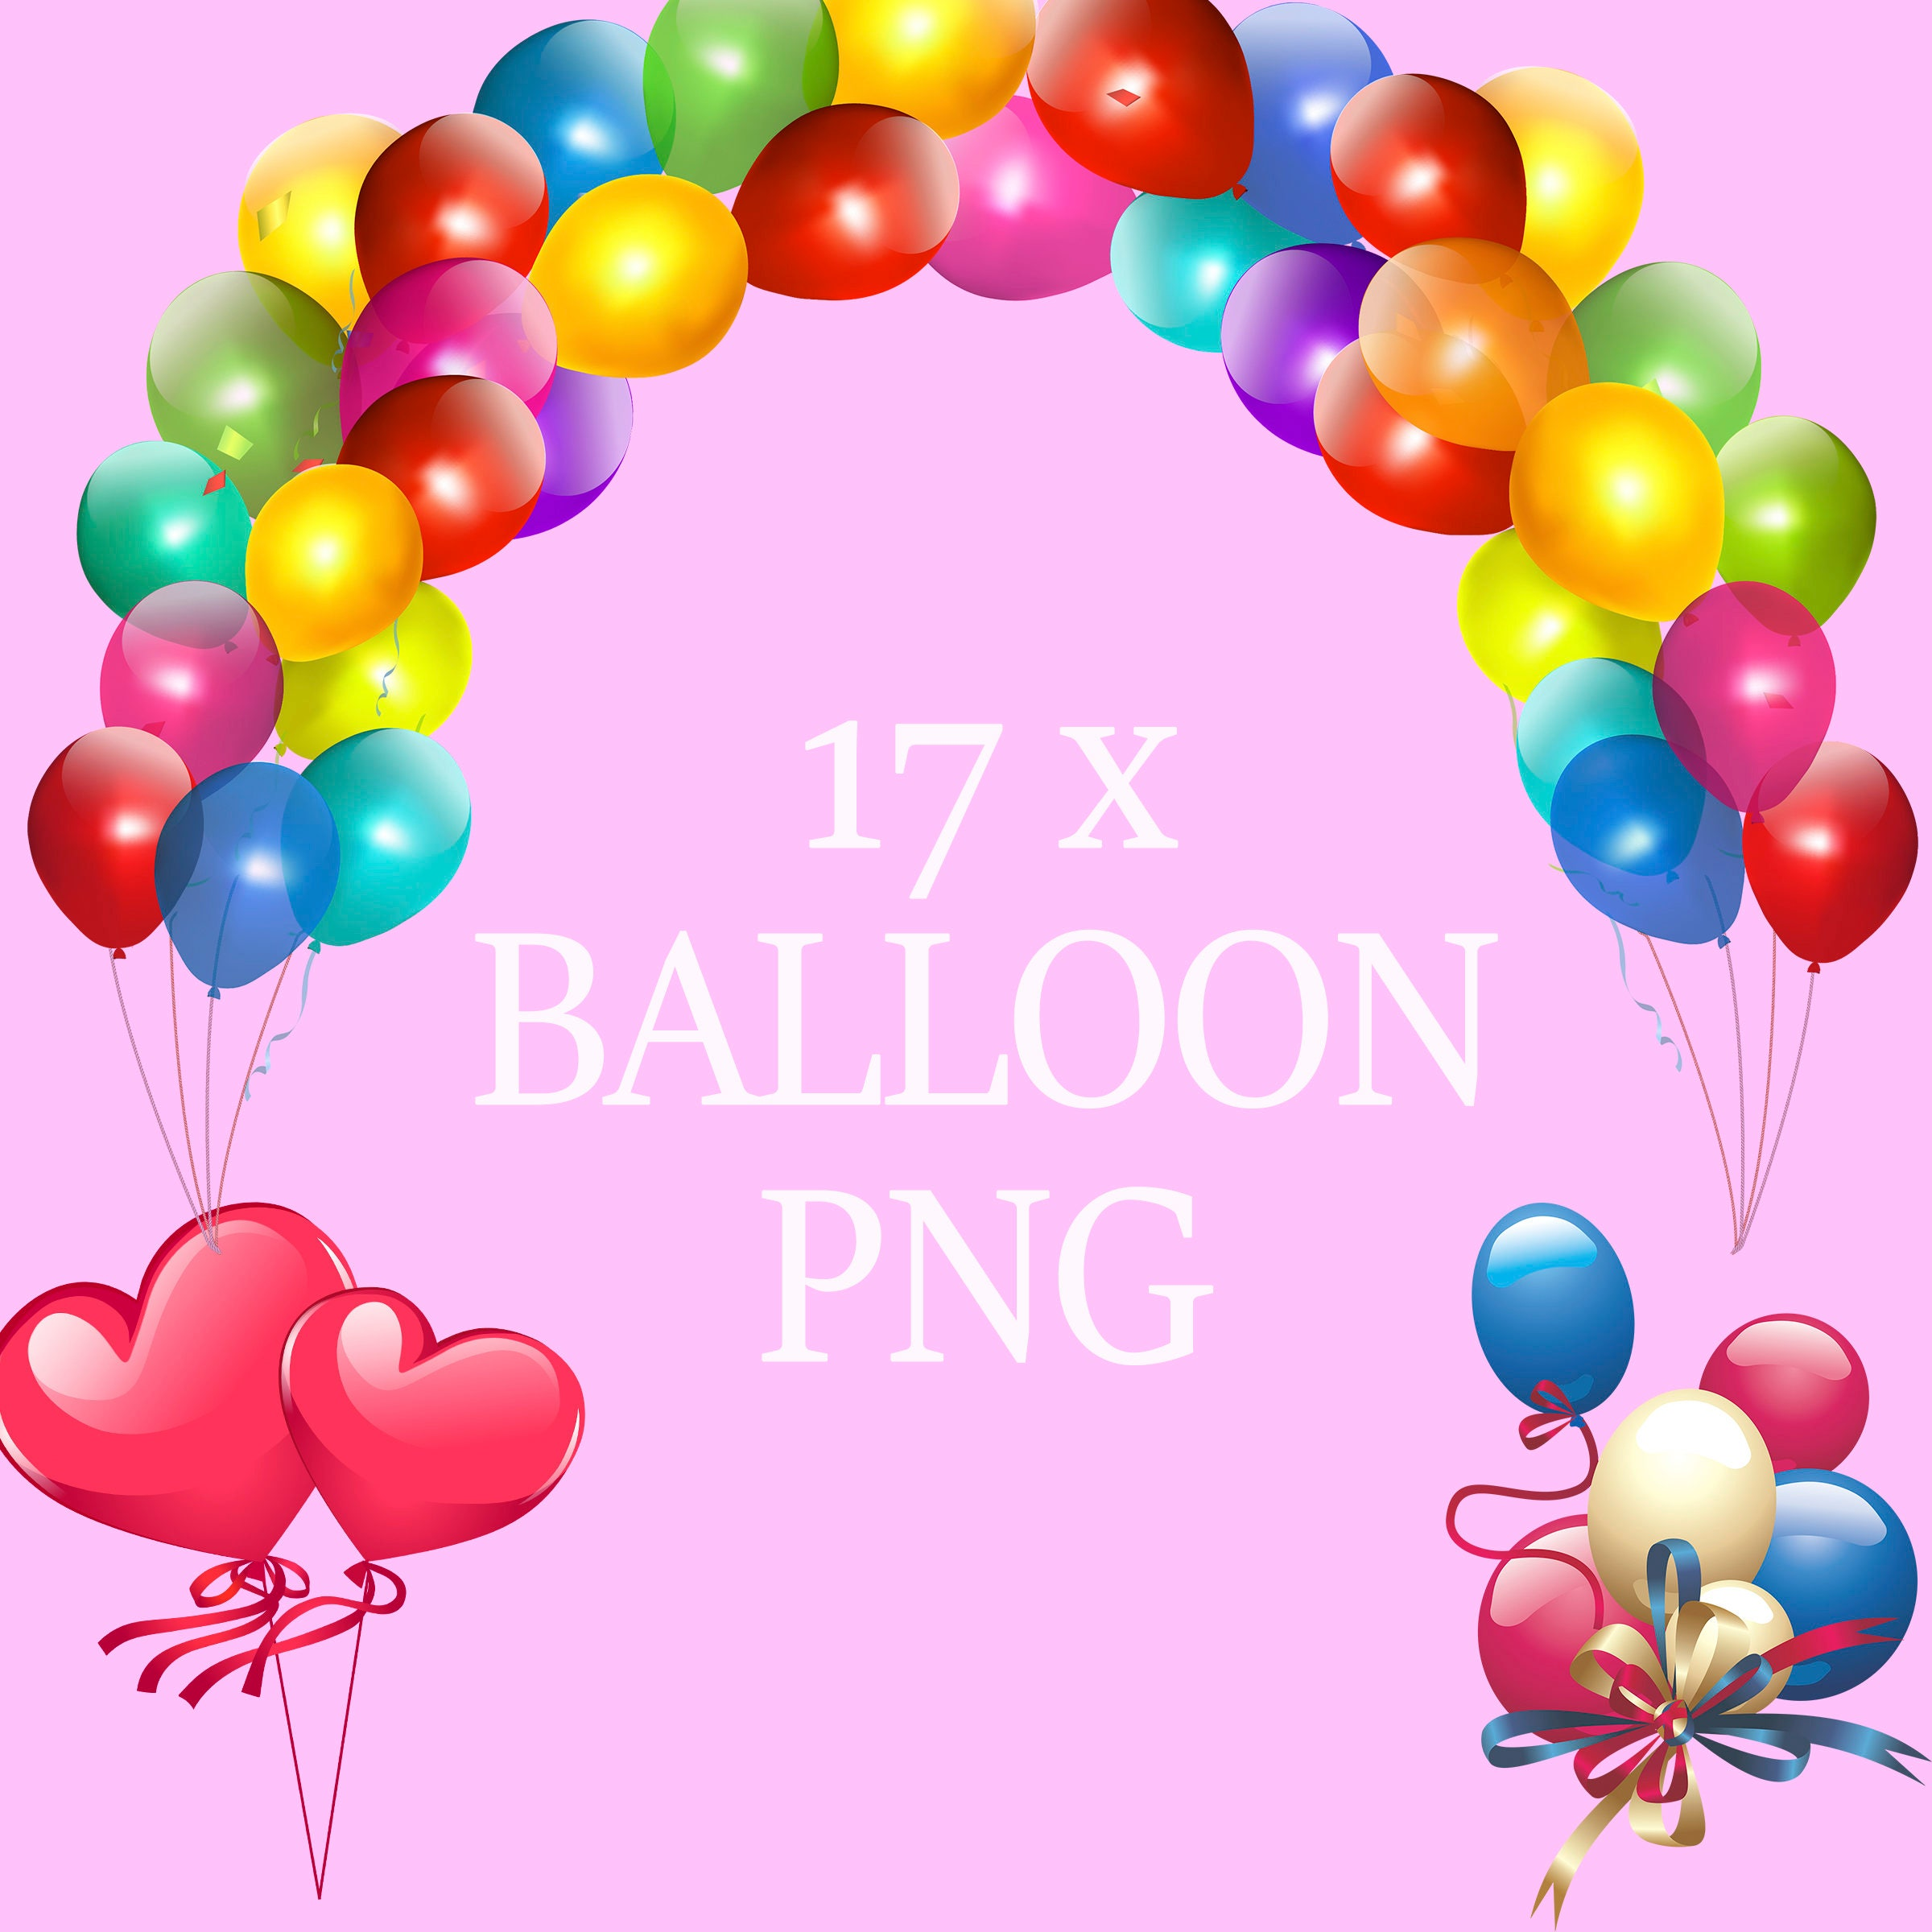 Balloon clip art overlays birthday invitations party